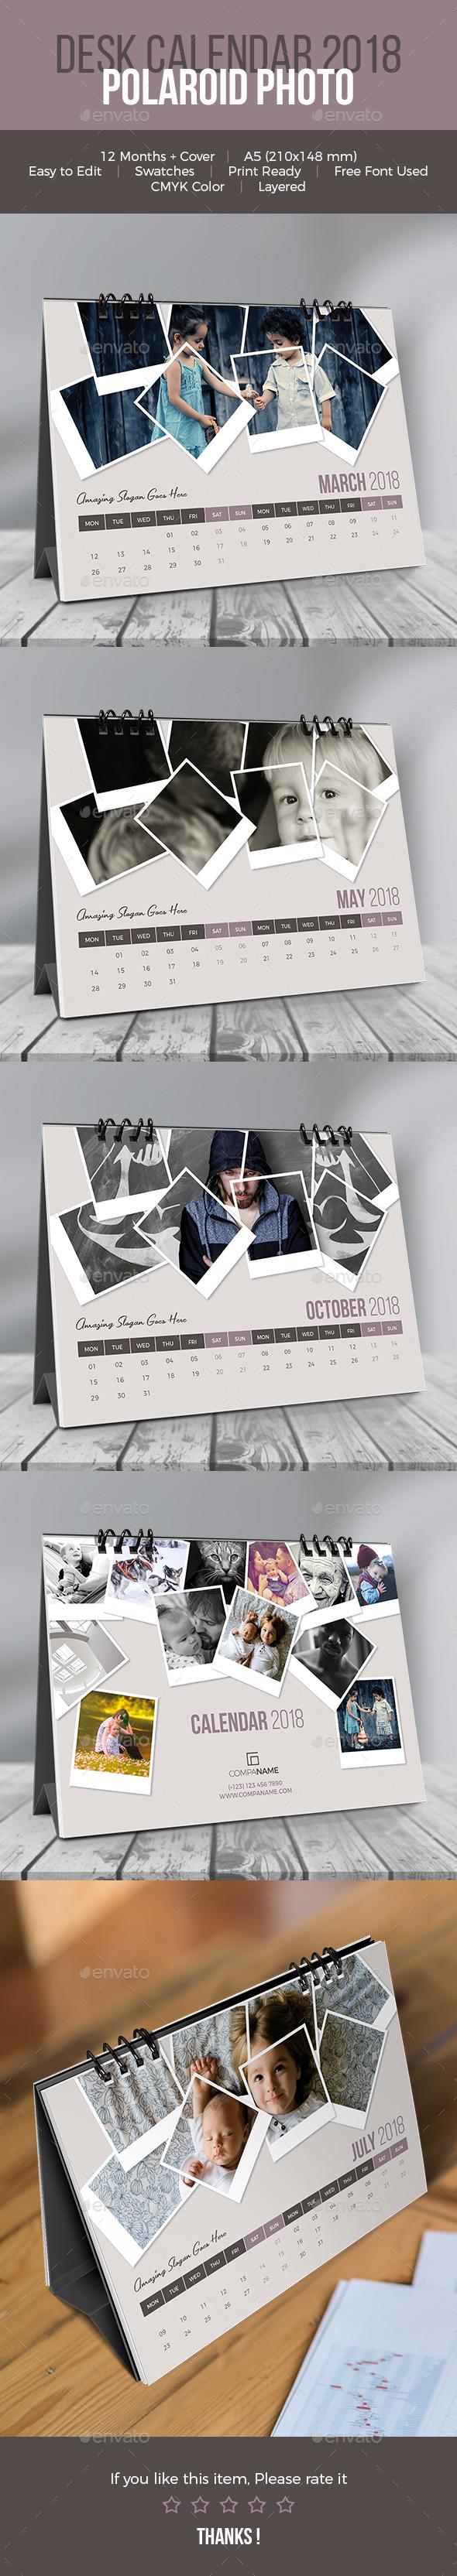 Desk Calendar 2018. Polaroid Photo - Calendars Stationery